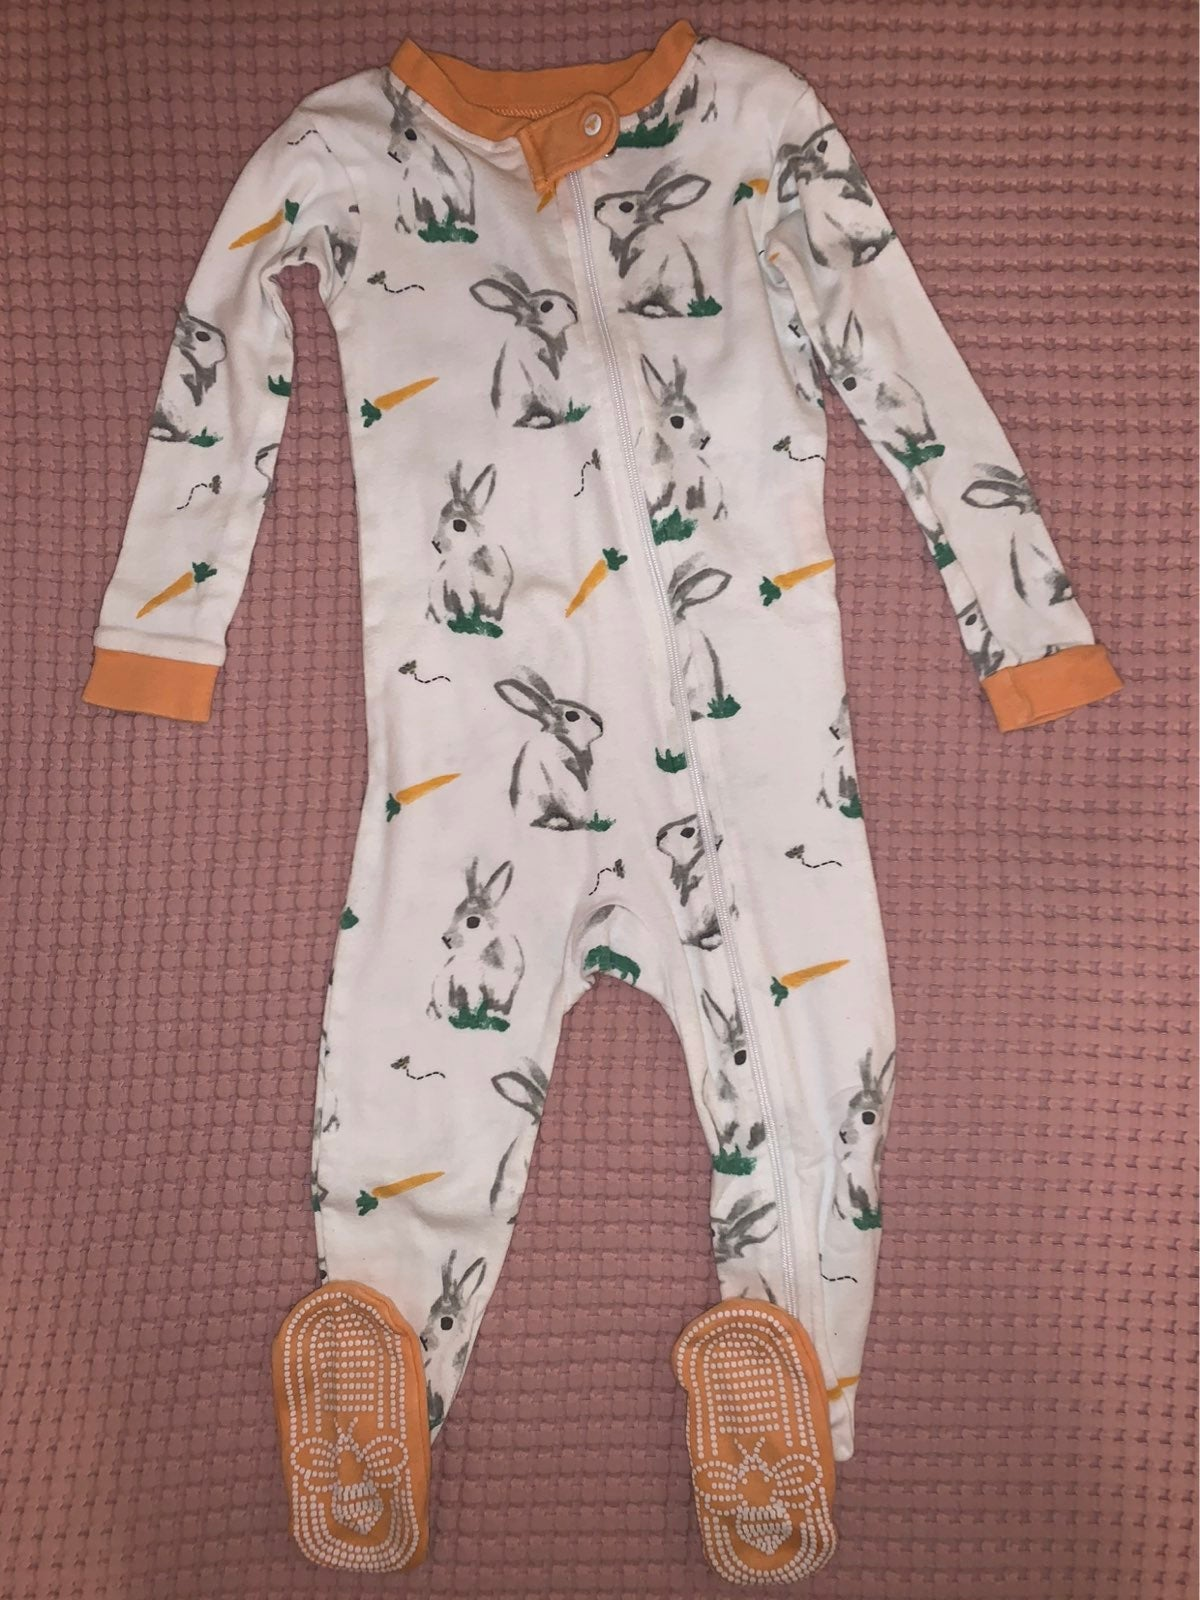 Burts Bees Bunny Pajamas Size 18 Months